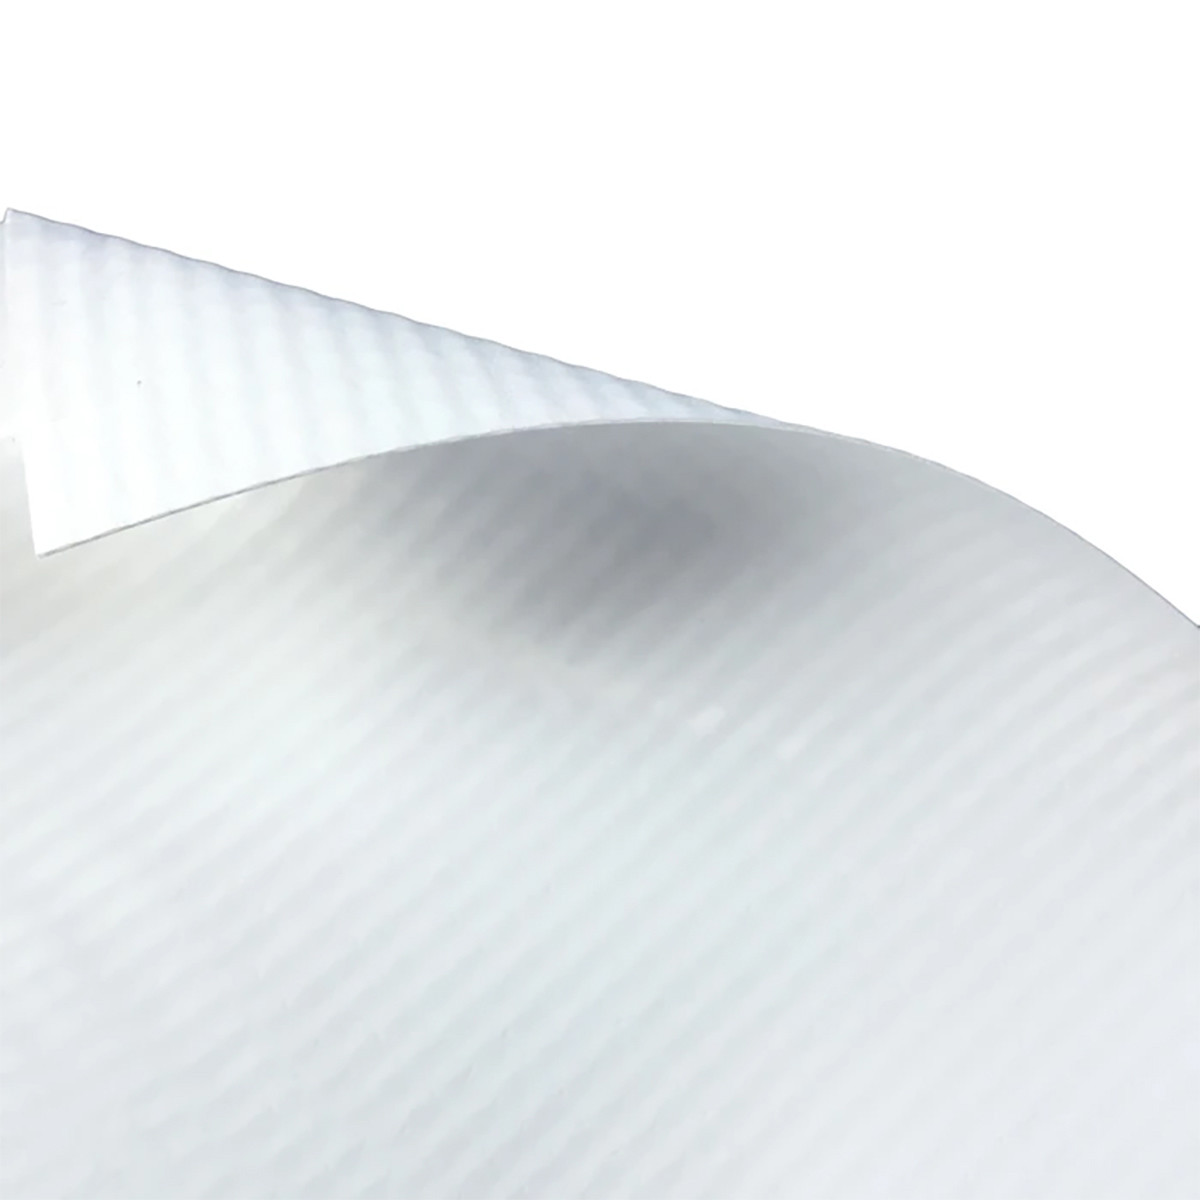 Frontlit baner 1.6x40m 440g sjaj